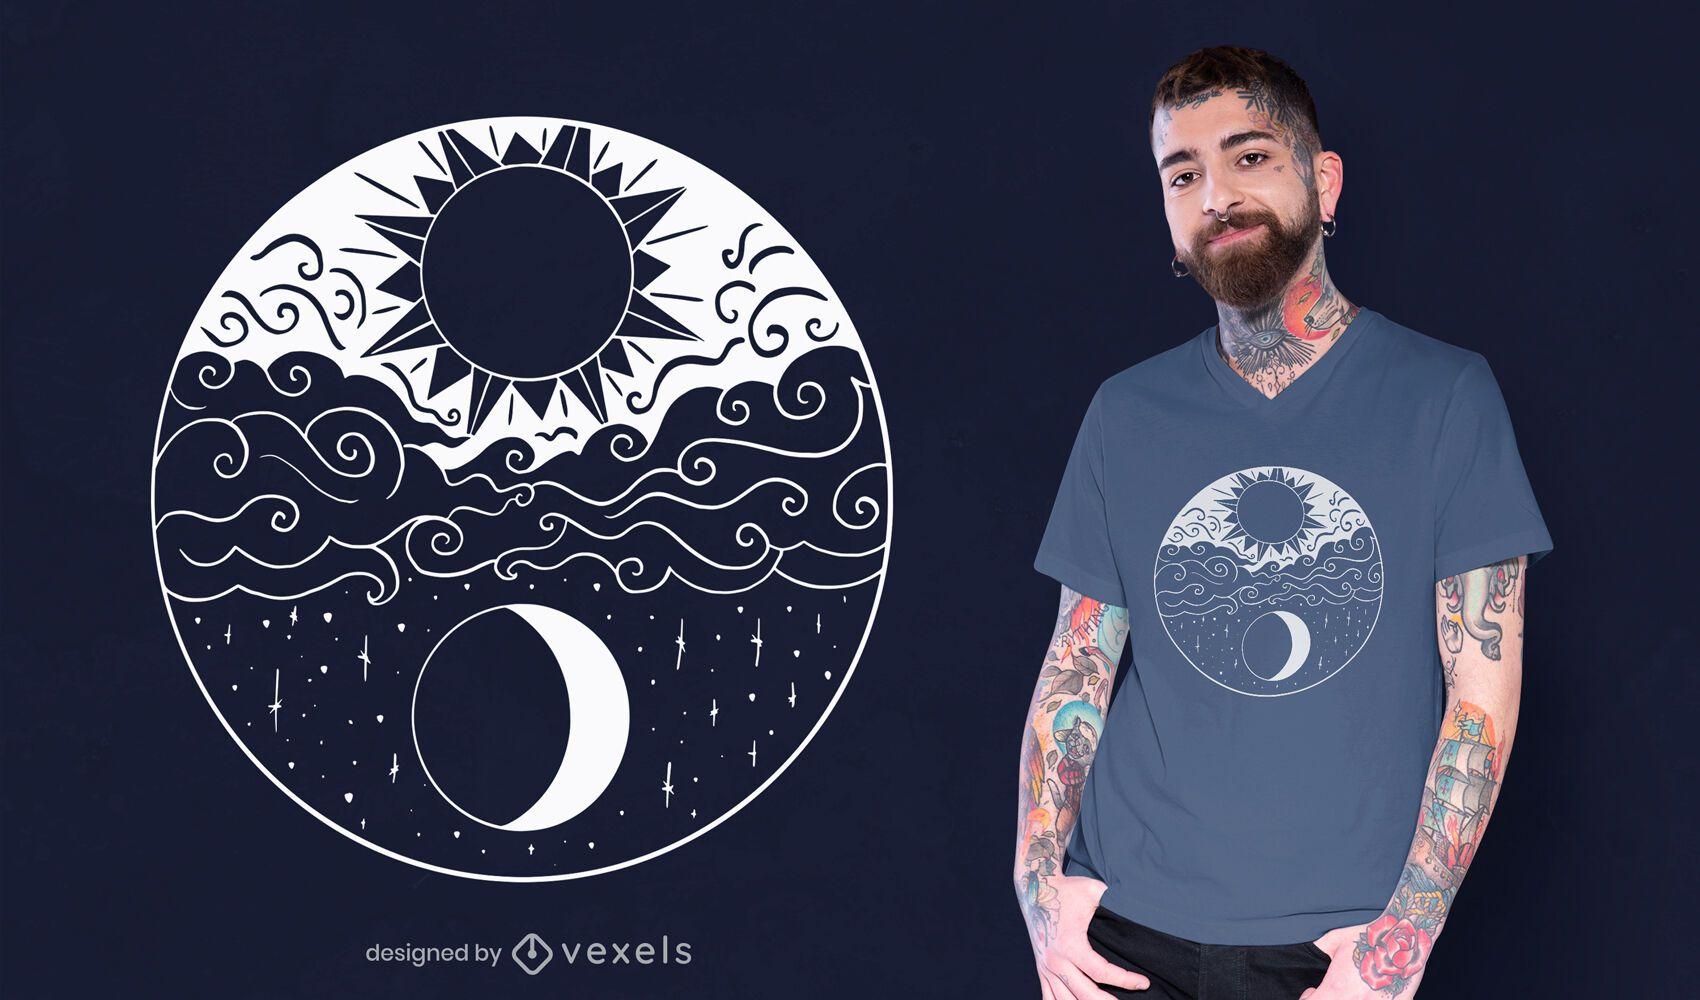 Artistic sun and moon t-shirt design